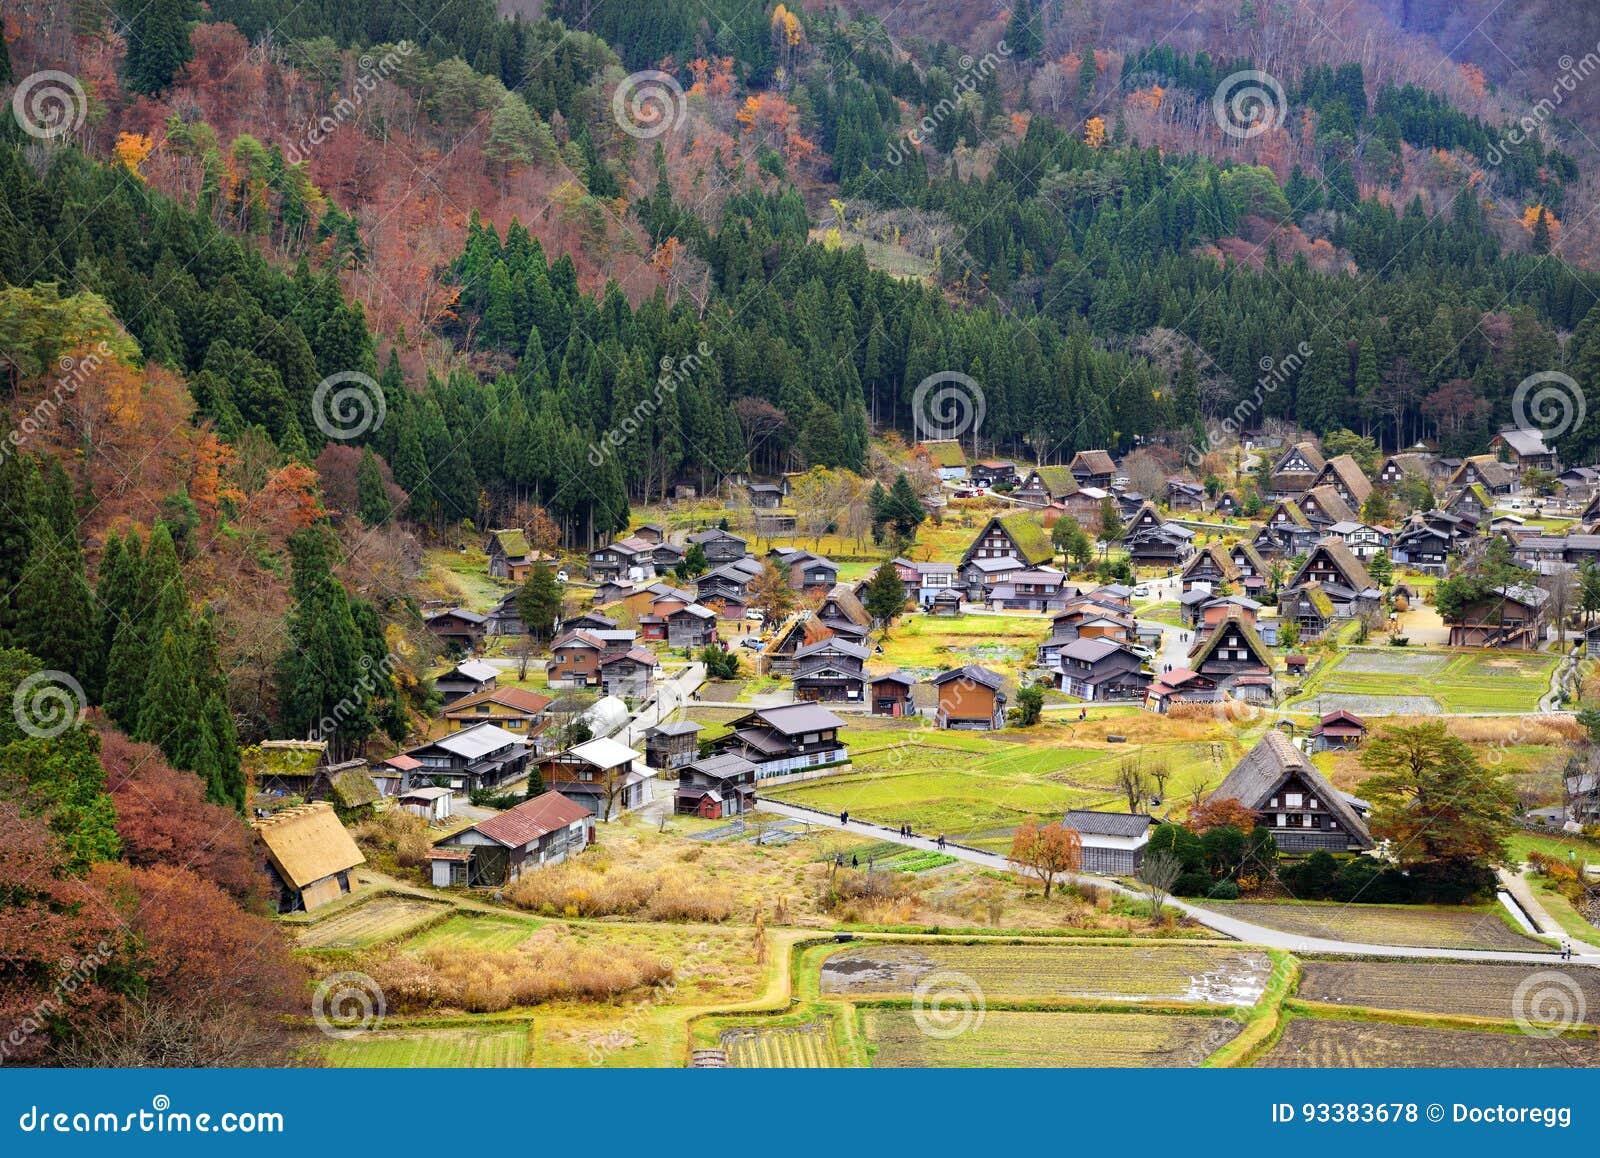 Shirakawago World Heritage Village In Colourful Autumn ...